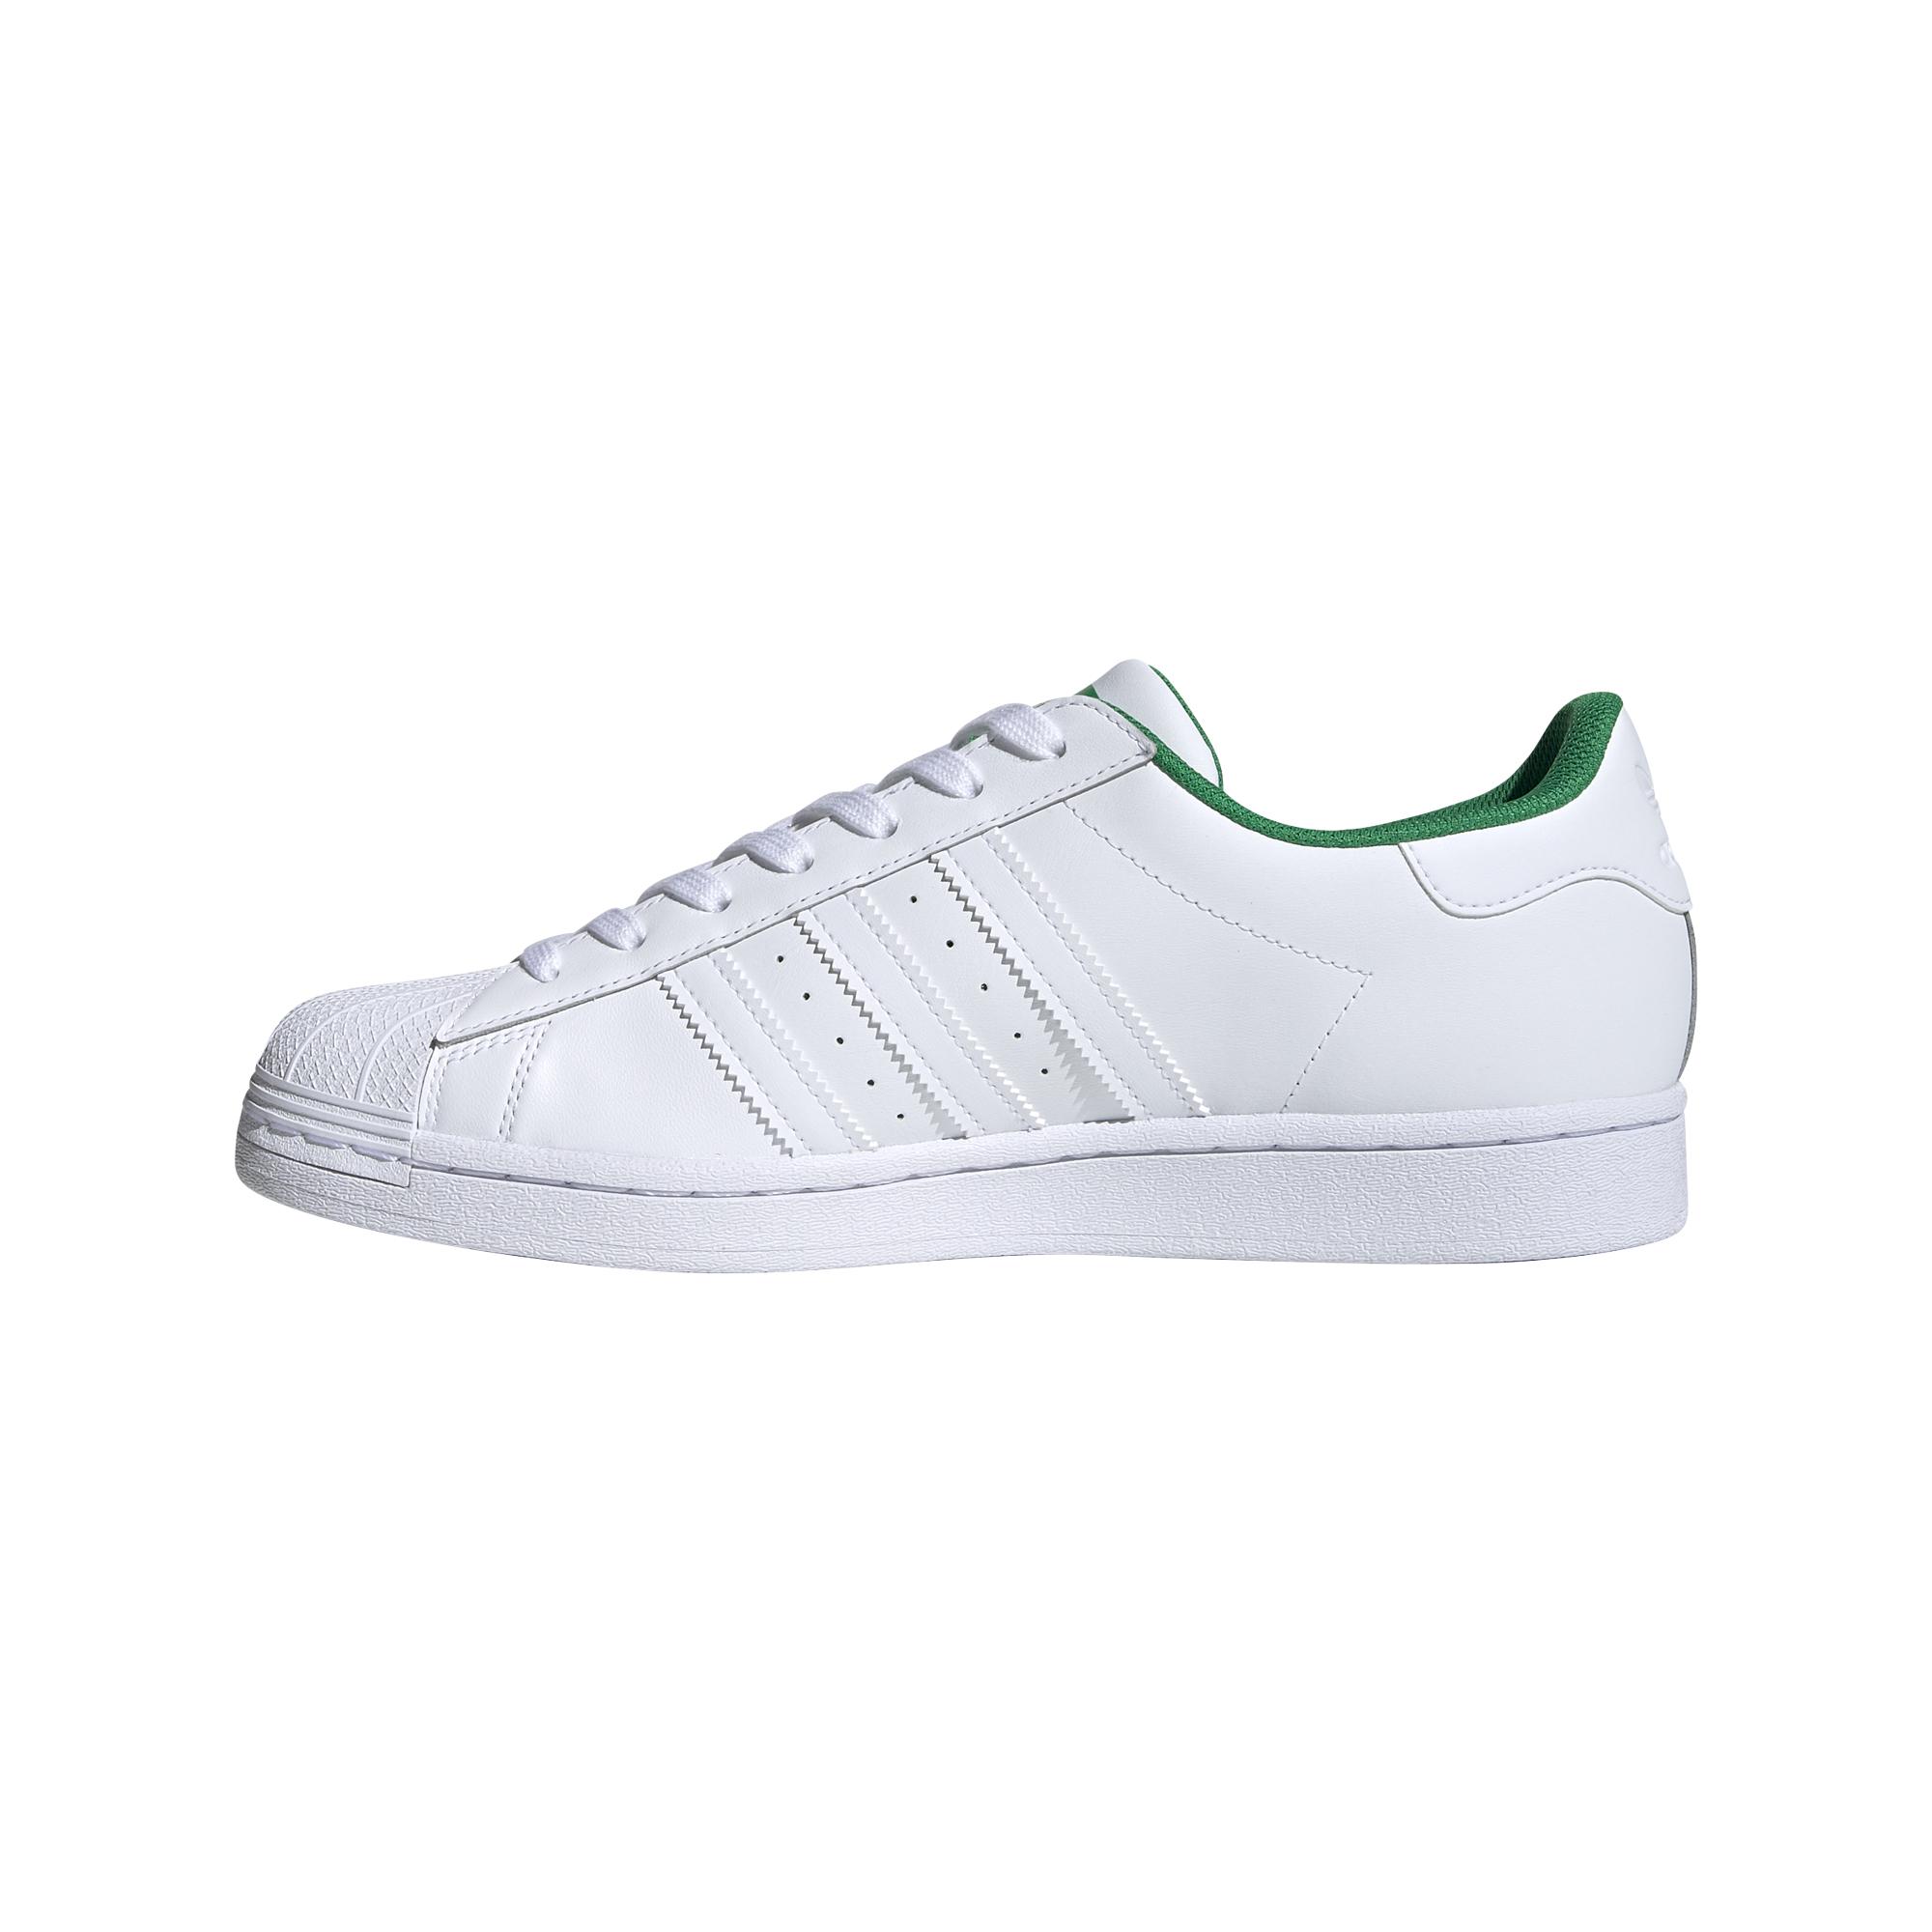 Pánské tenisky a boty adidas Superstar Ftw White/ Ftw White/ Green